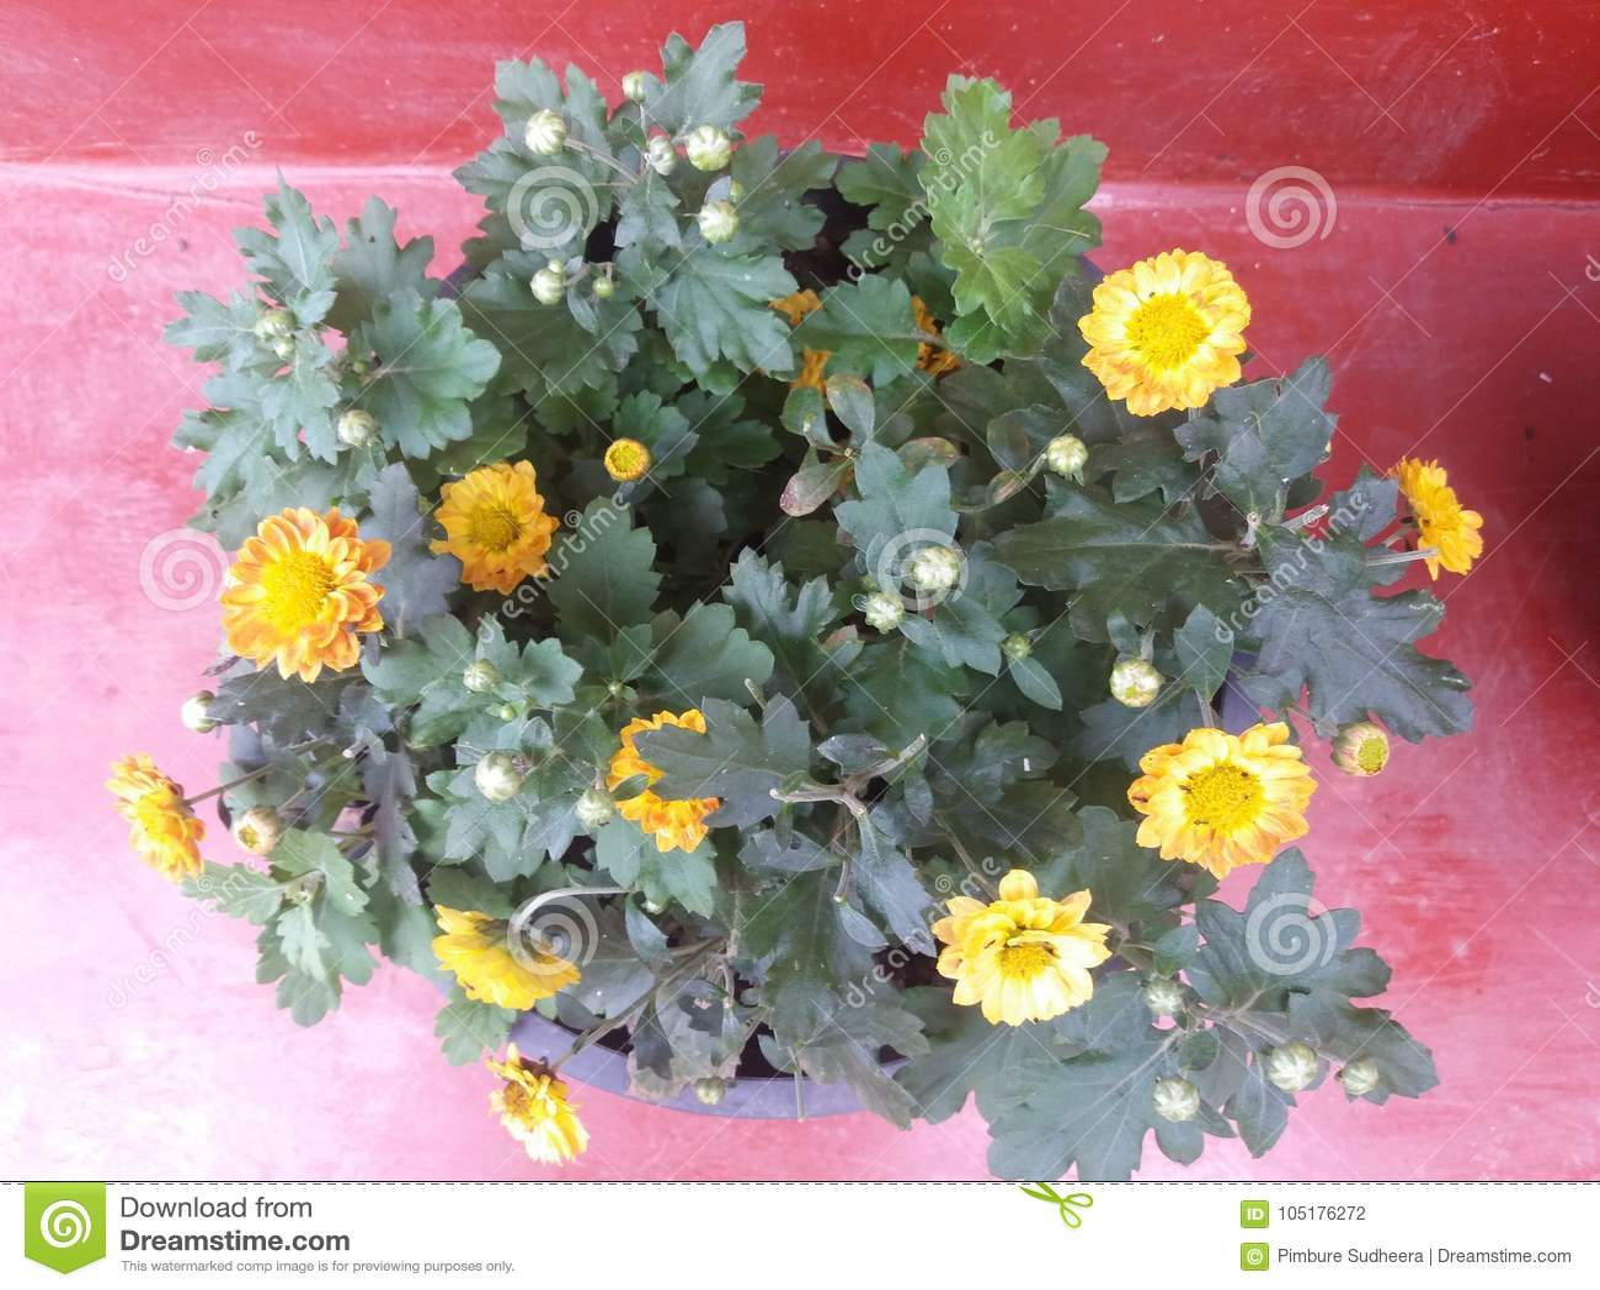 Beautiful flowers in sri lanka home gradan flowers pant stock photo royalty free stock photo izmirmasajfo Choice Image